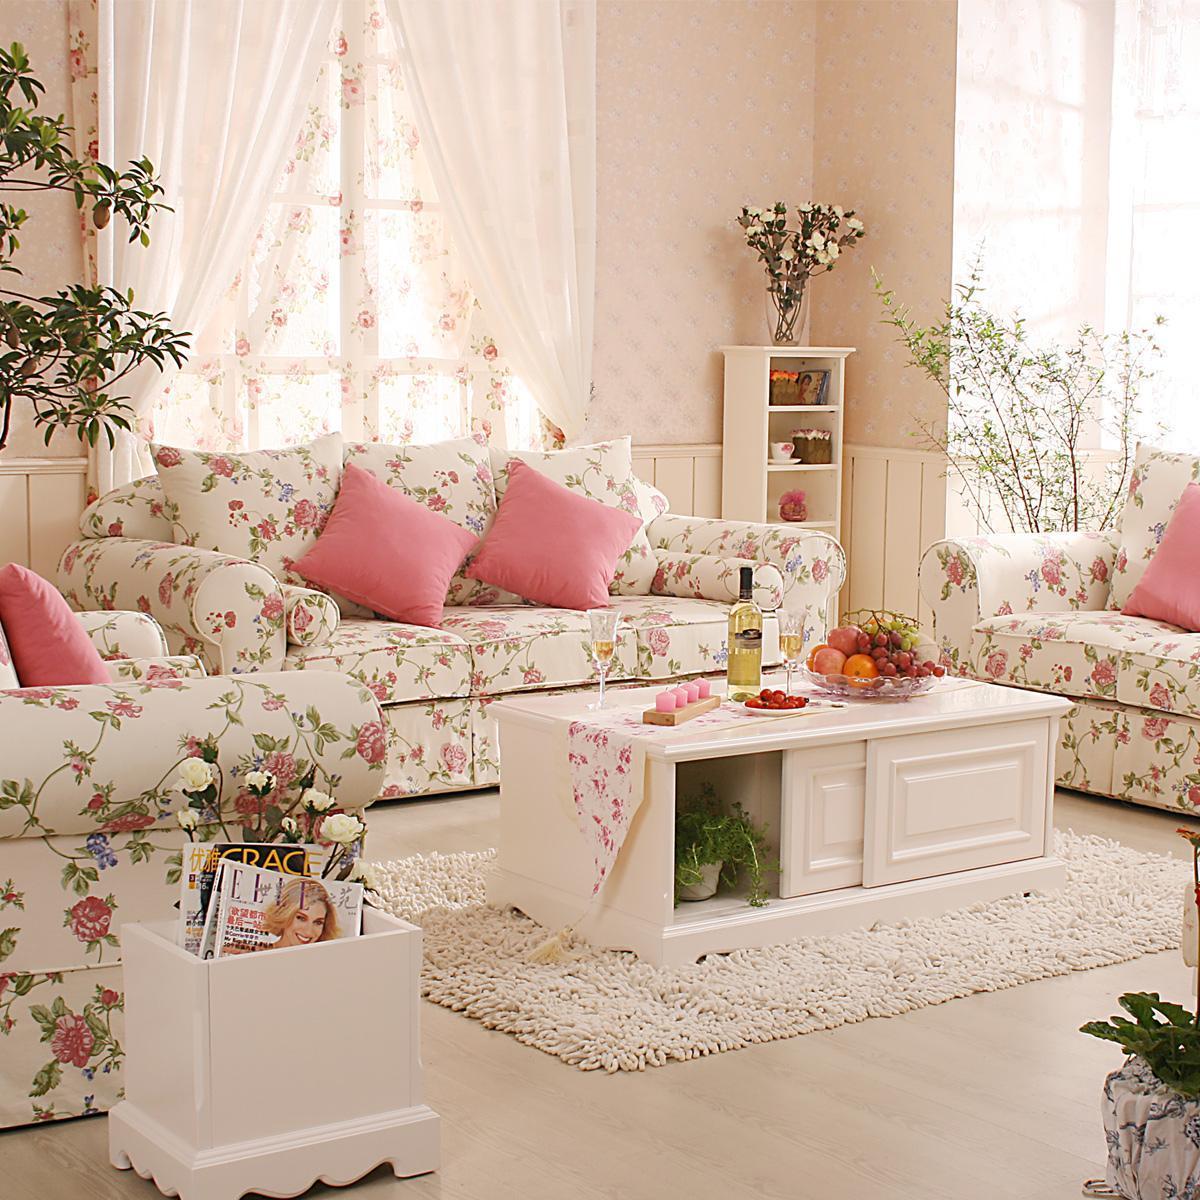 Romantic Living Room Ideas - Interior Design Inspirations on Living Room Style Ideas  id=40180